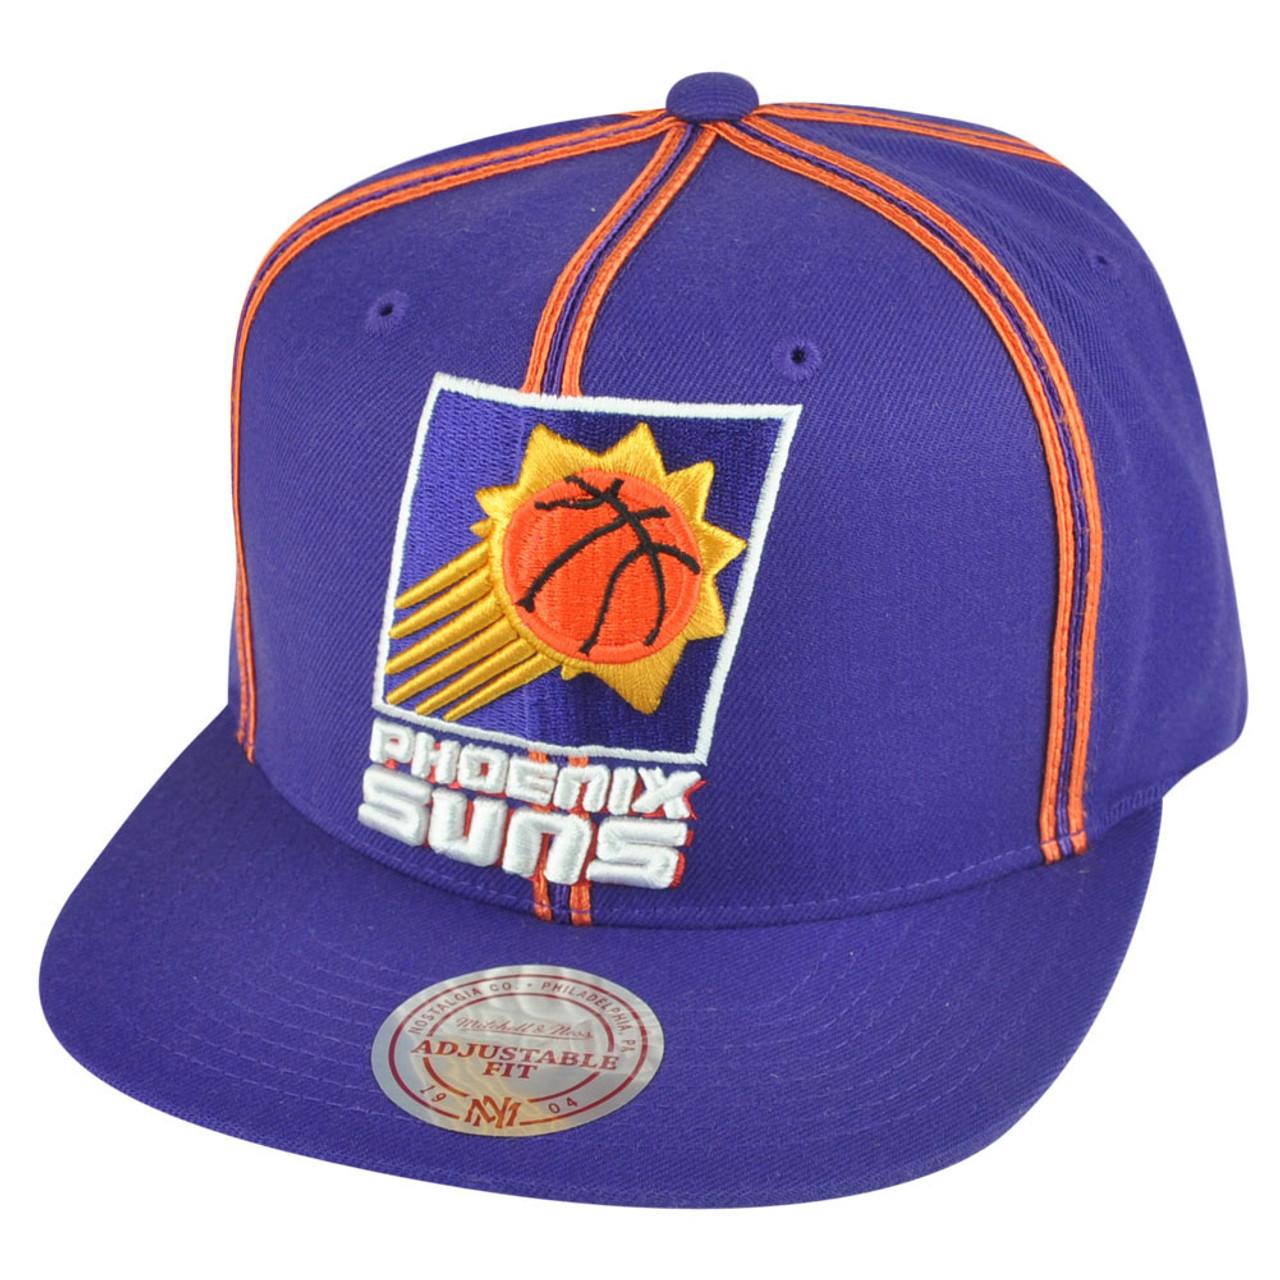 timeless design 726ab 82b71 NBA Mitchell Ness HWC Phoenix Suns NJ08 Panel Outline Retro Snapback Hat Cap